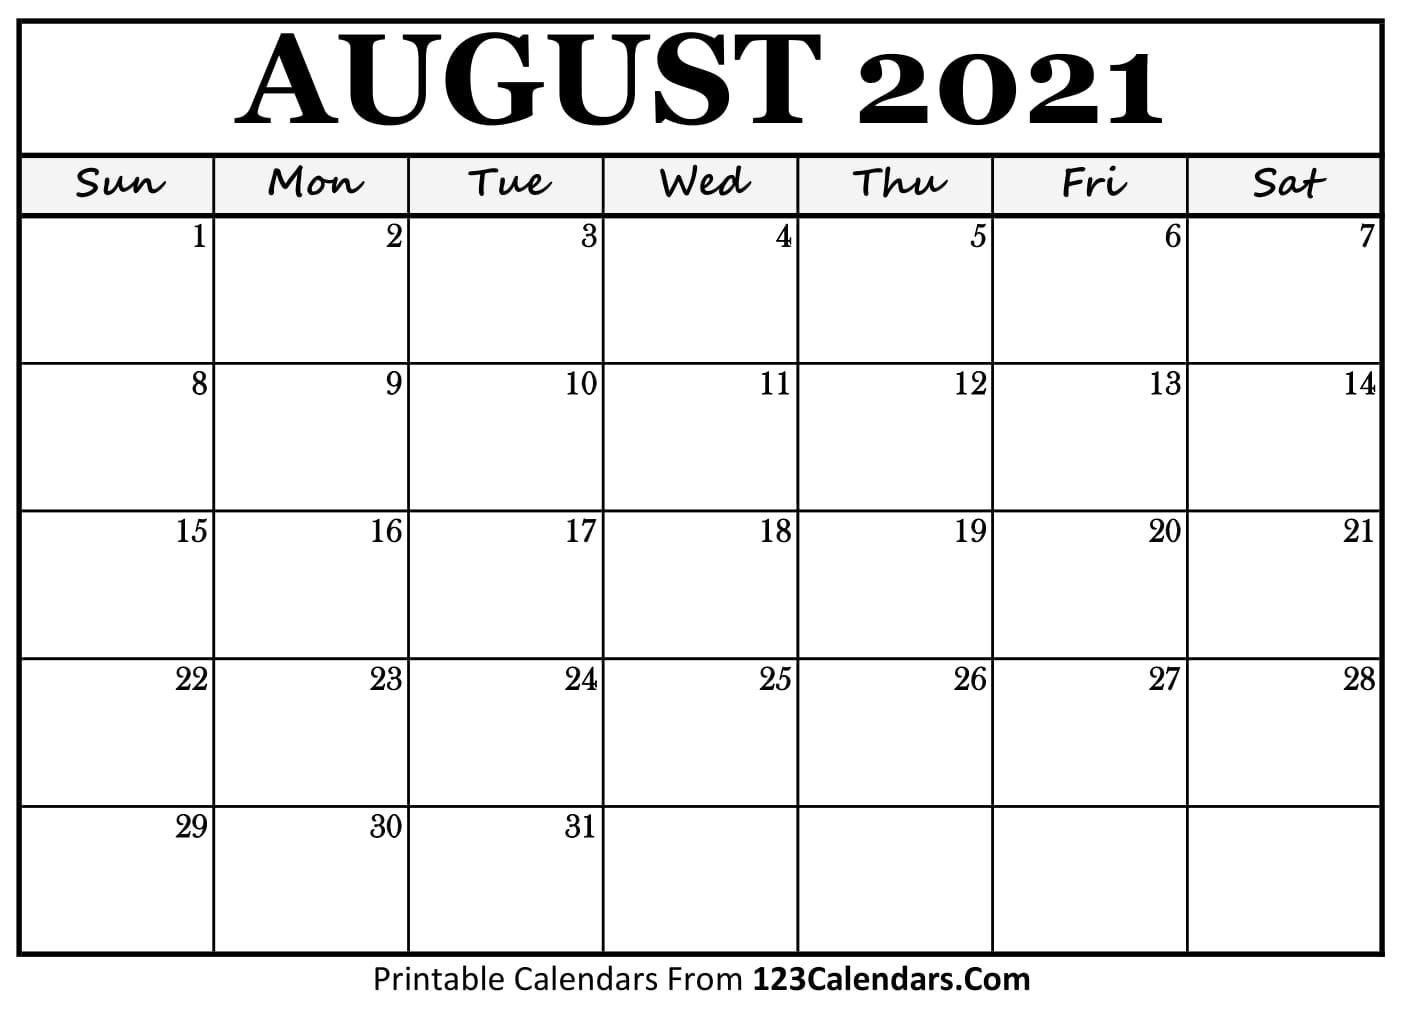 Printable August 2021 Calendar Templates - 123Calendars Calendar August 2020 To May 2021